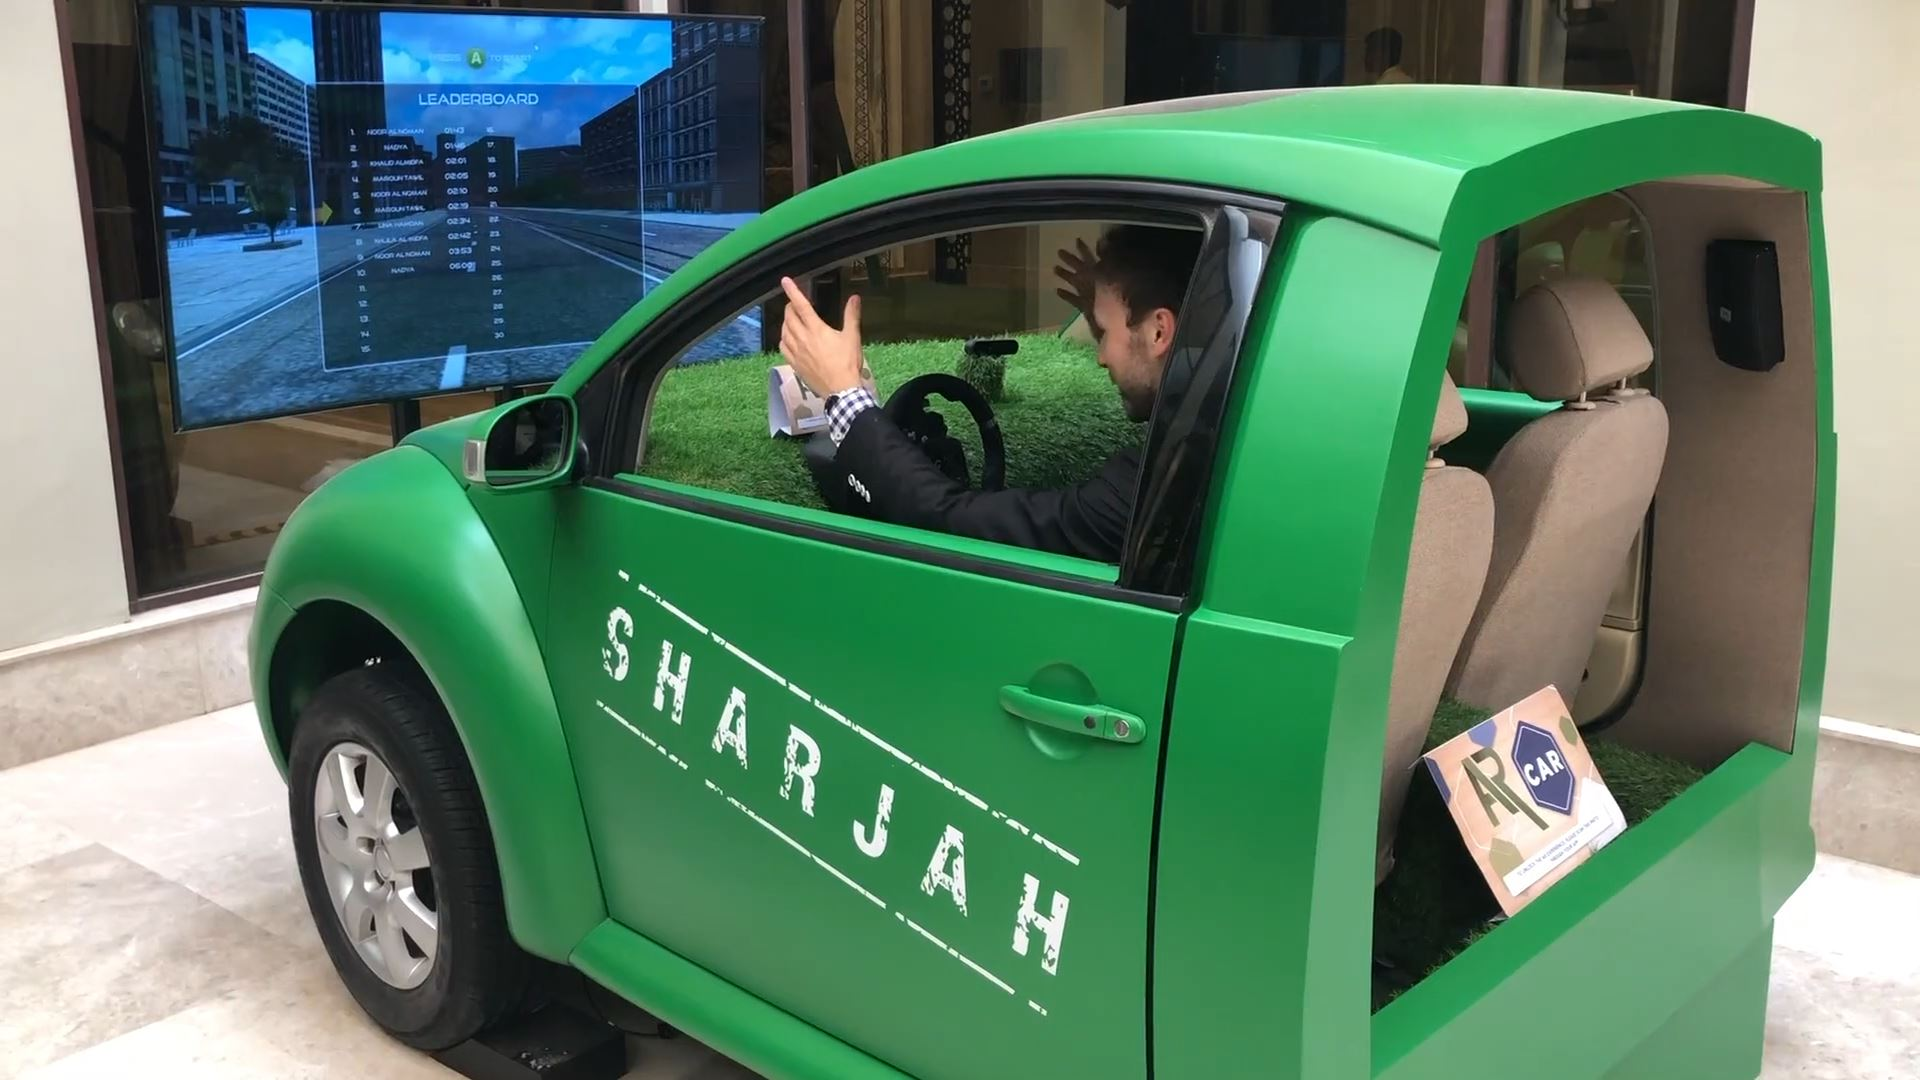 sharjah e-Government retreat interactive technology integration racing simulator